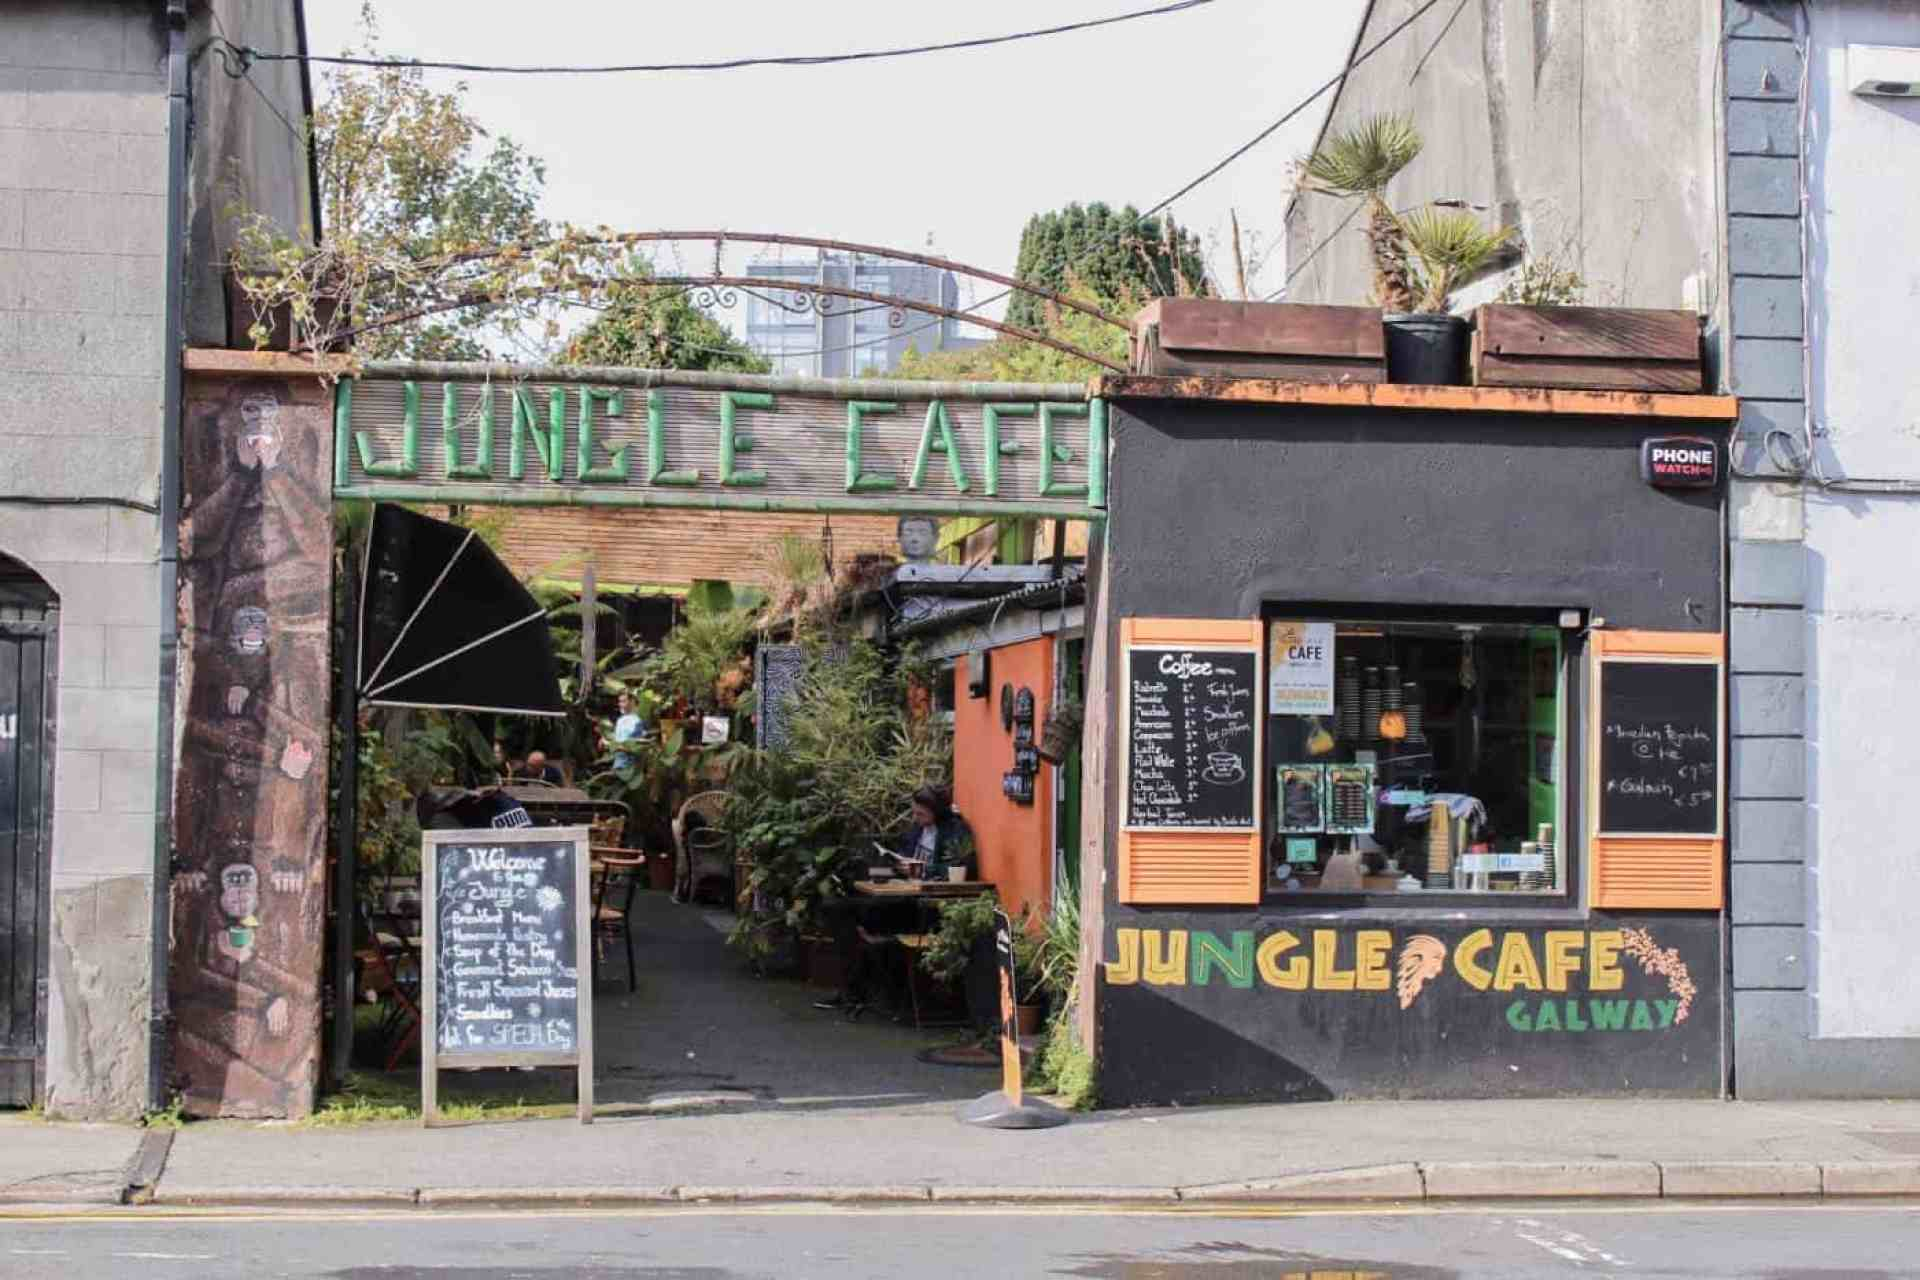 Jungle Cafe, Galway, Ireland